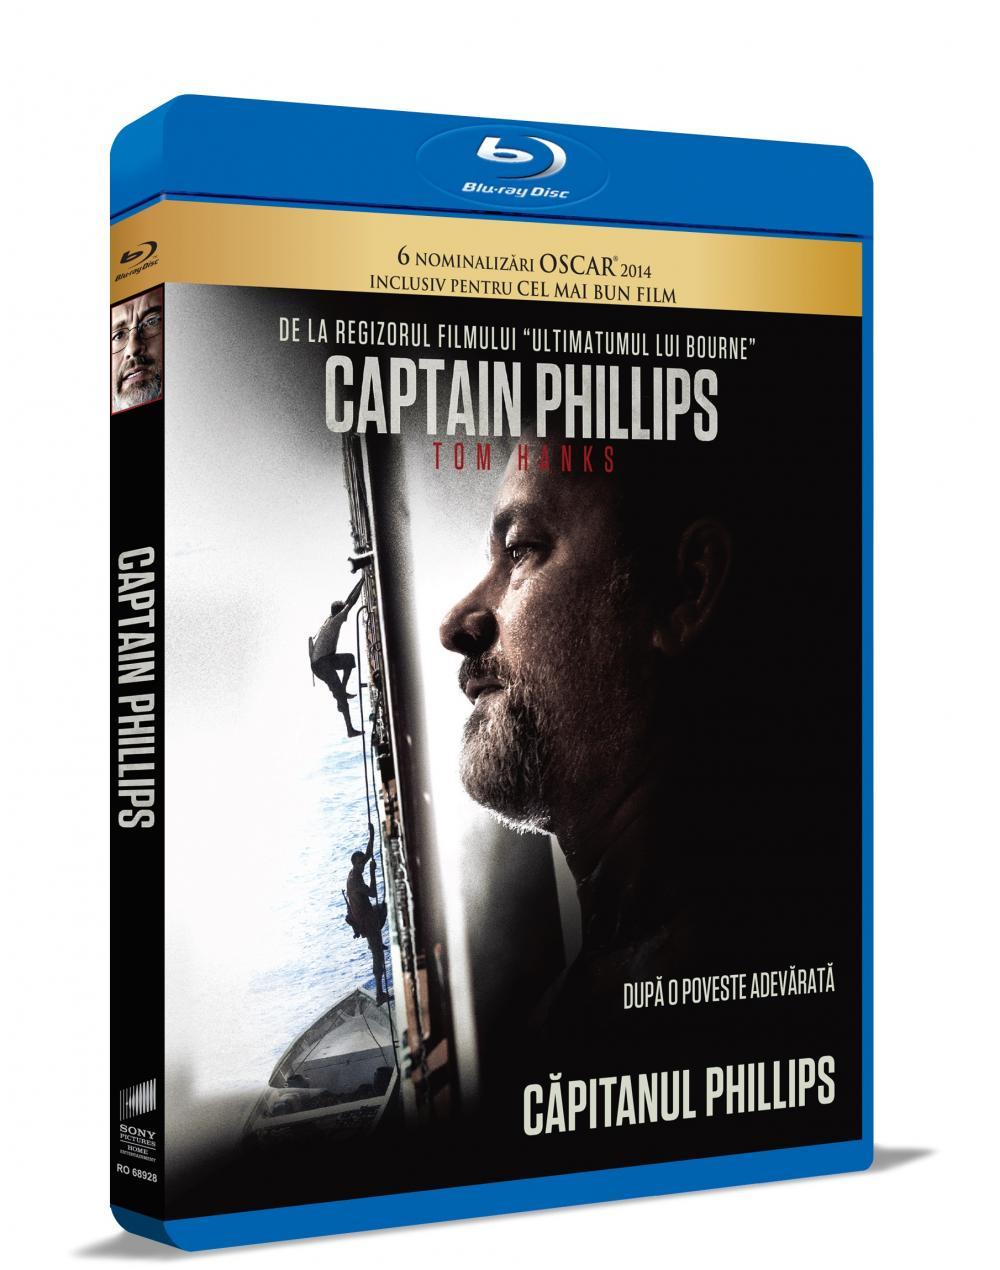 BD: CAPTAIN PHILLIPS - CAPITANUL PHILLIPS